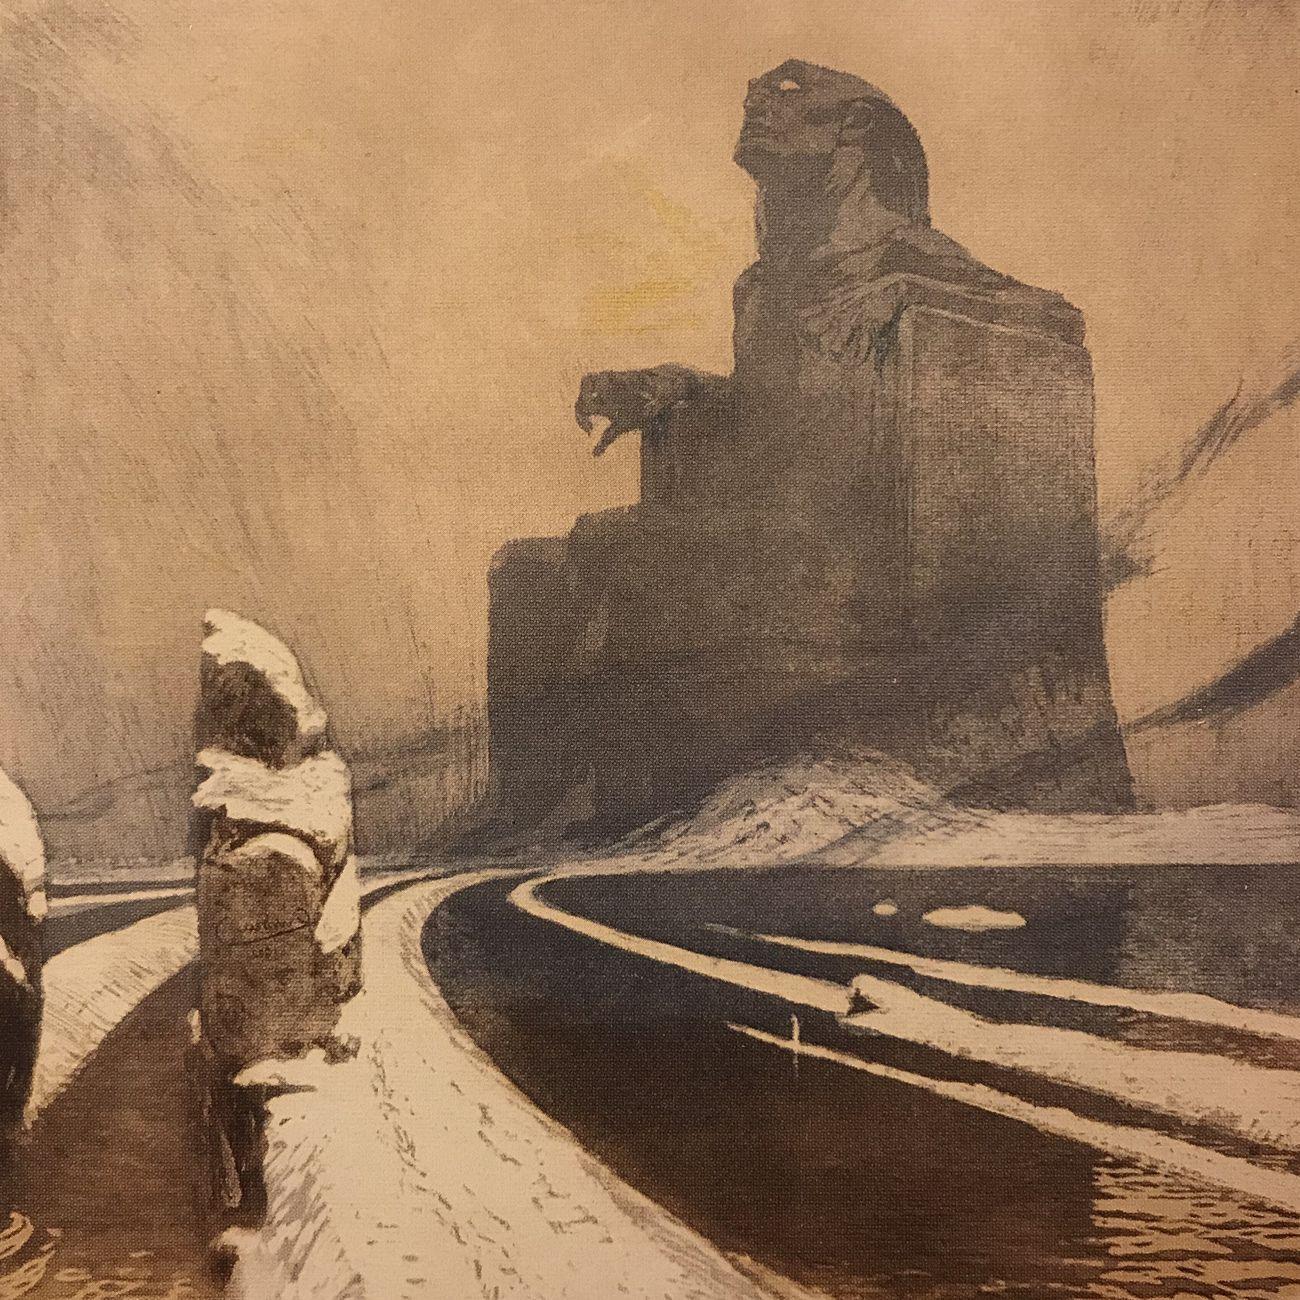 Frantisek Kupka, Idolo nero, 1903, Praga, Patrik Simon's Collection